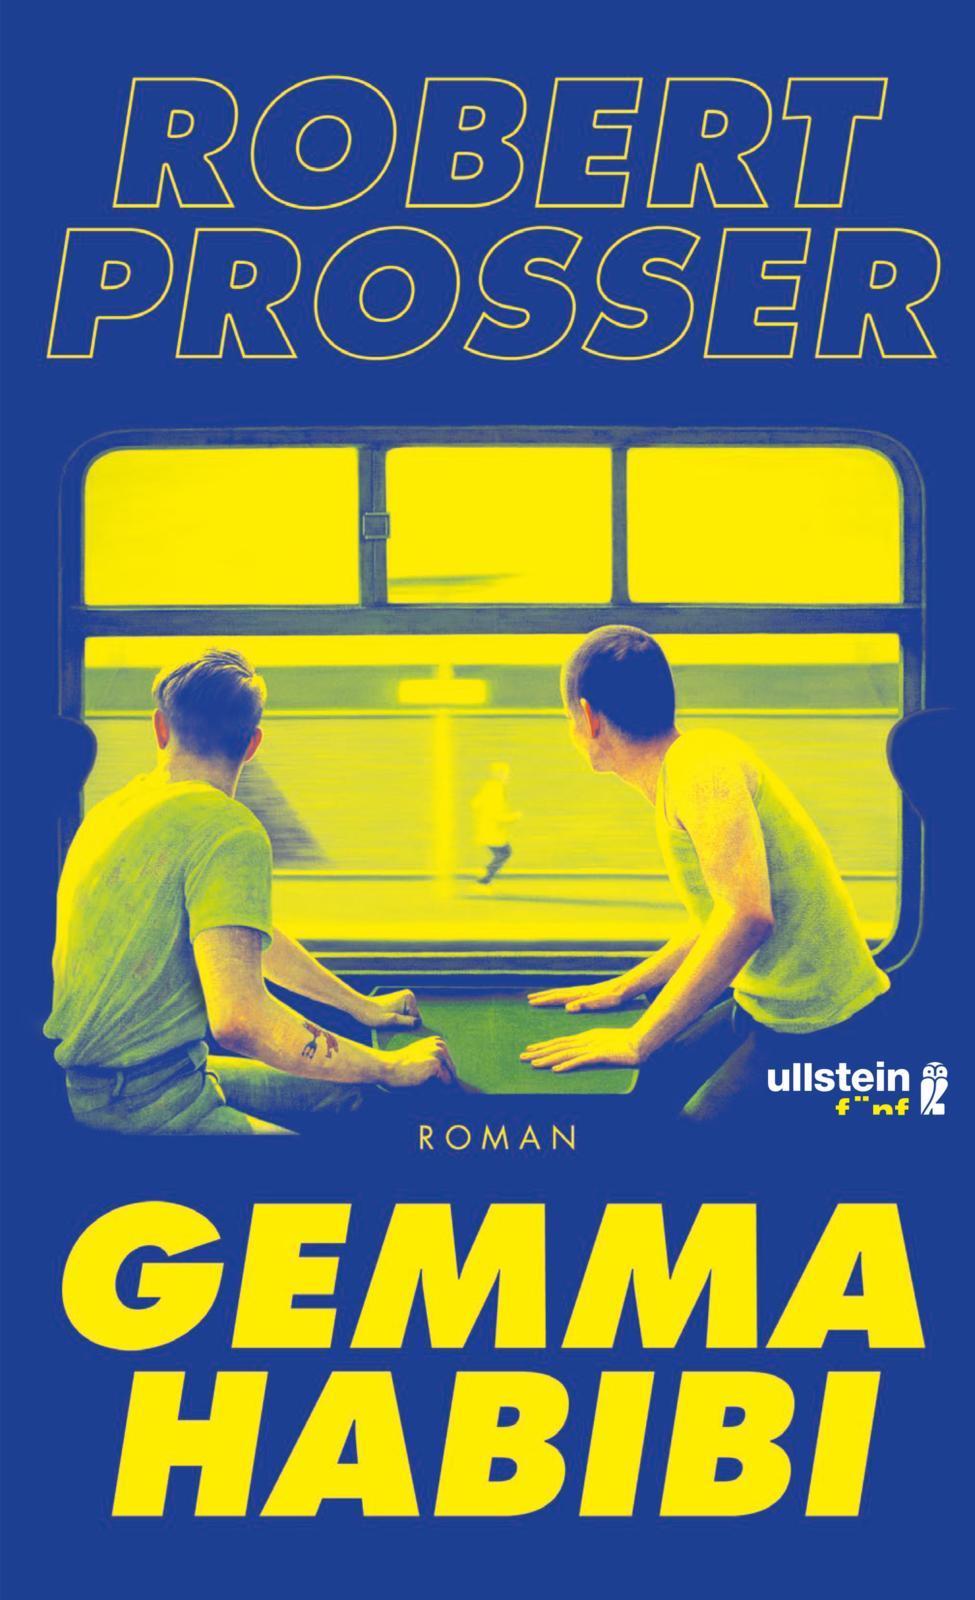 Gemma Habibi - Roberto Prosser